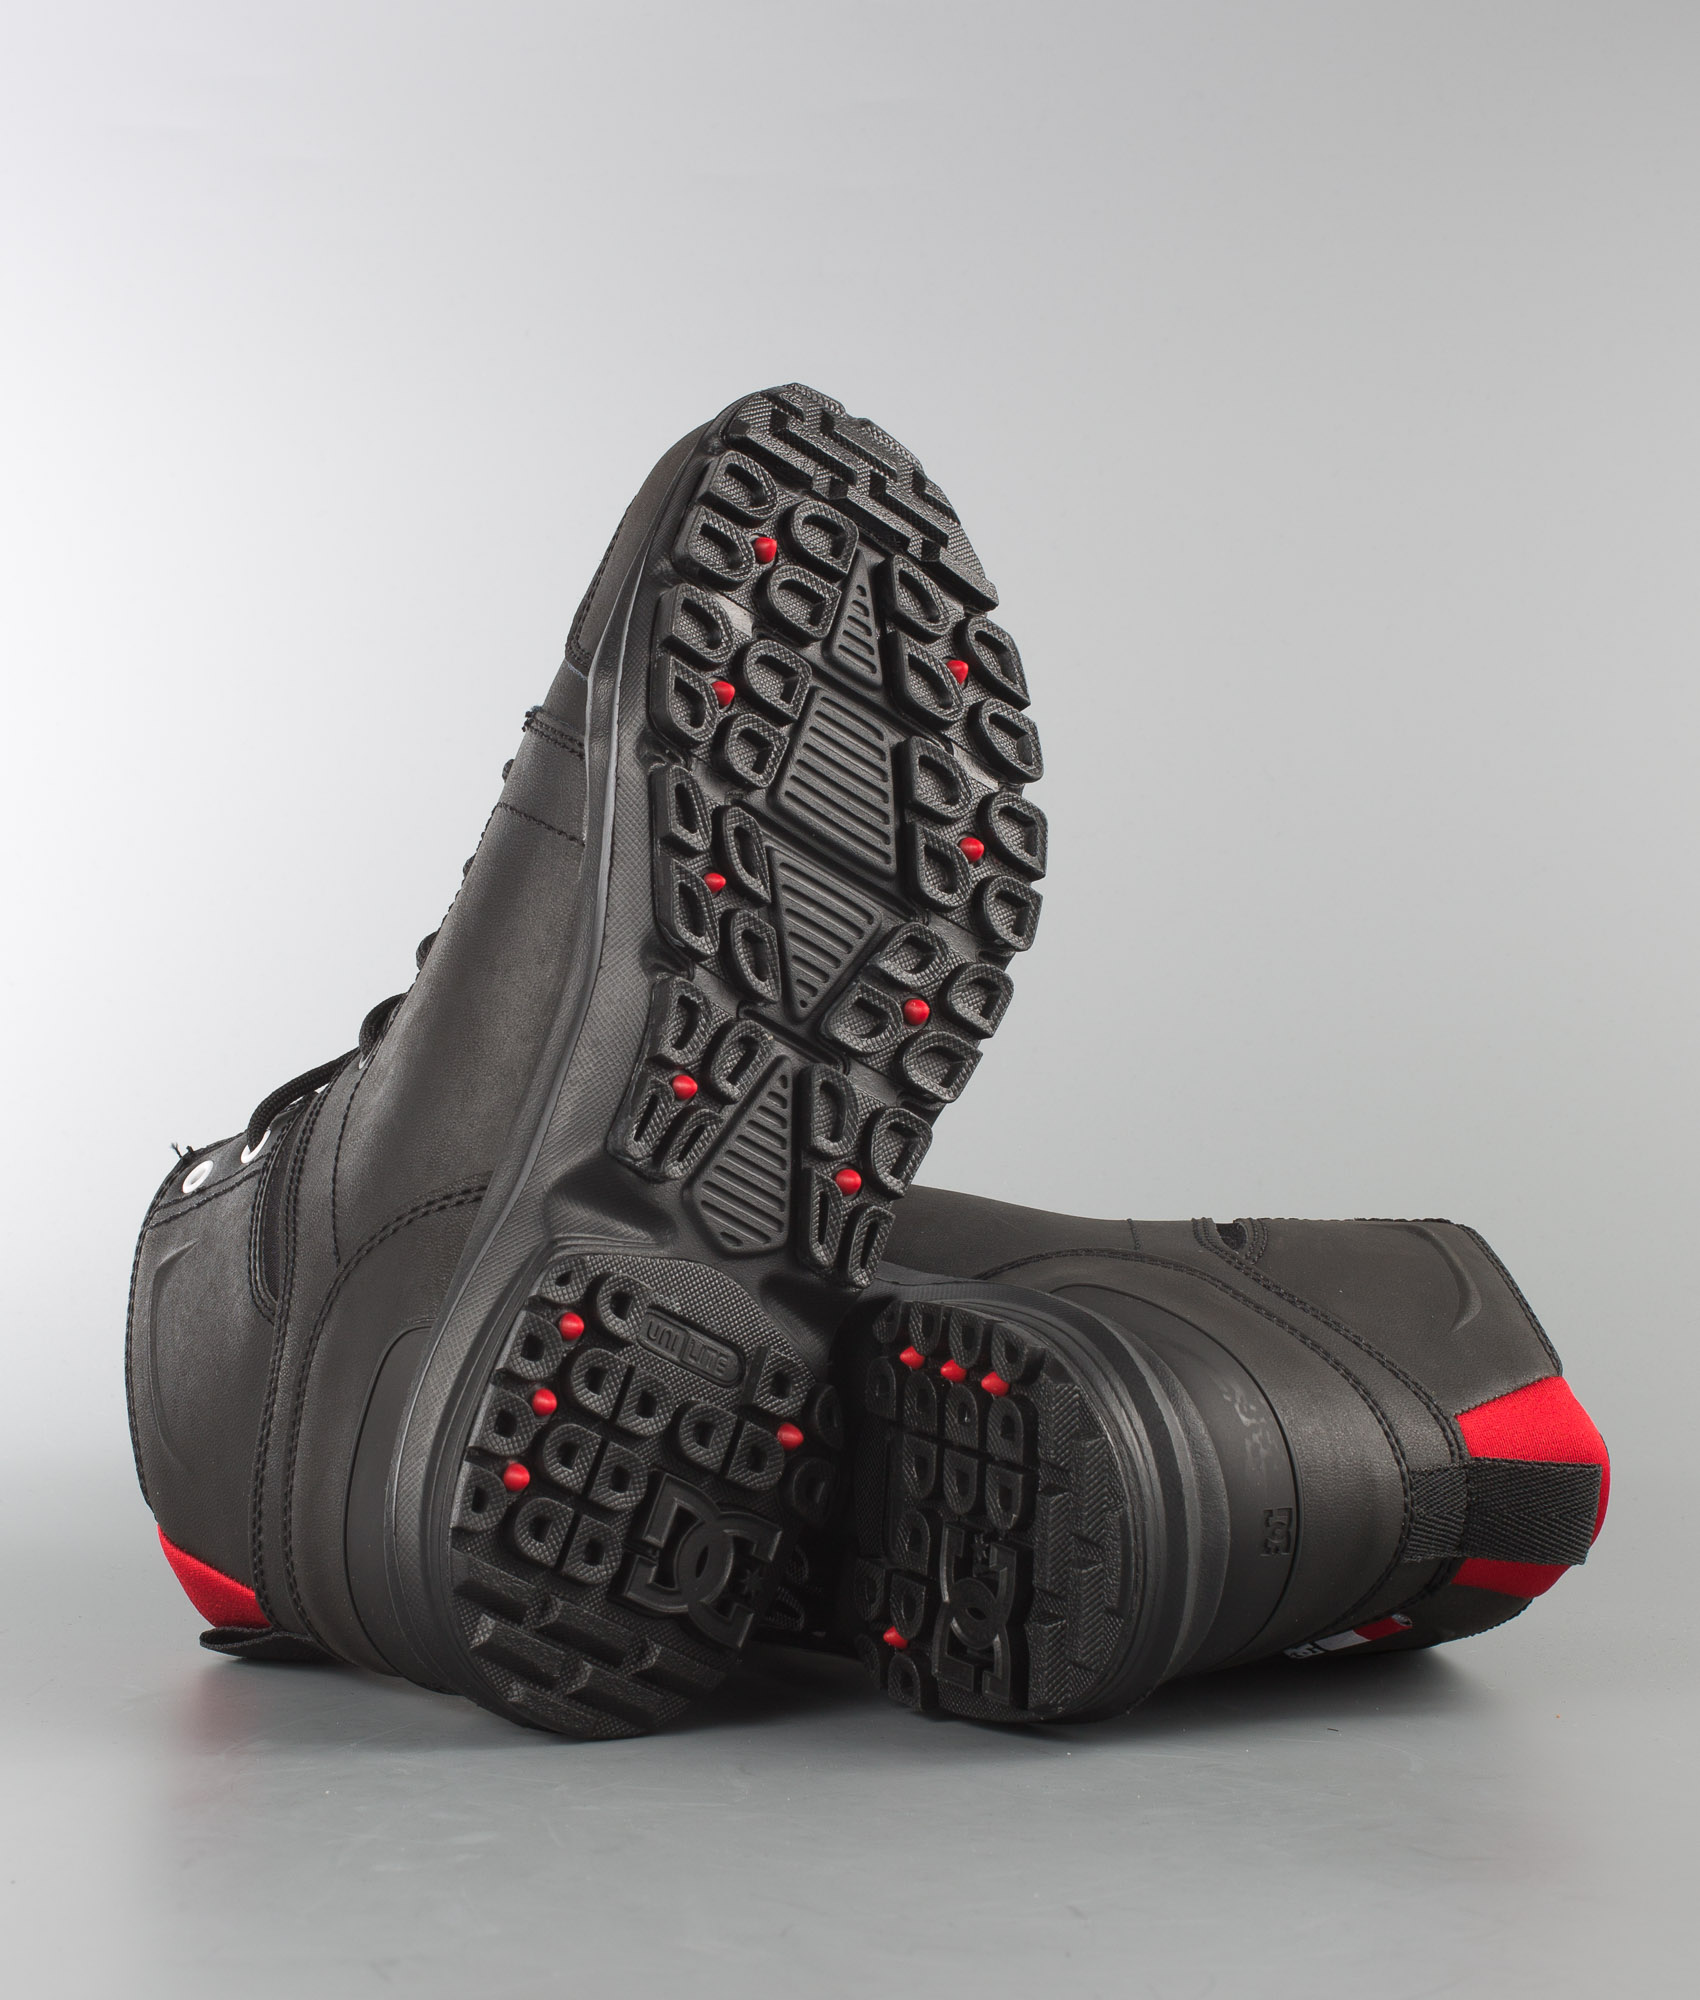 Redwhite Dc Chez Chaussures Blackathletic De Torstein pgYYqn1O